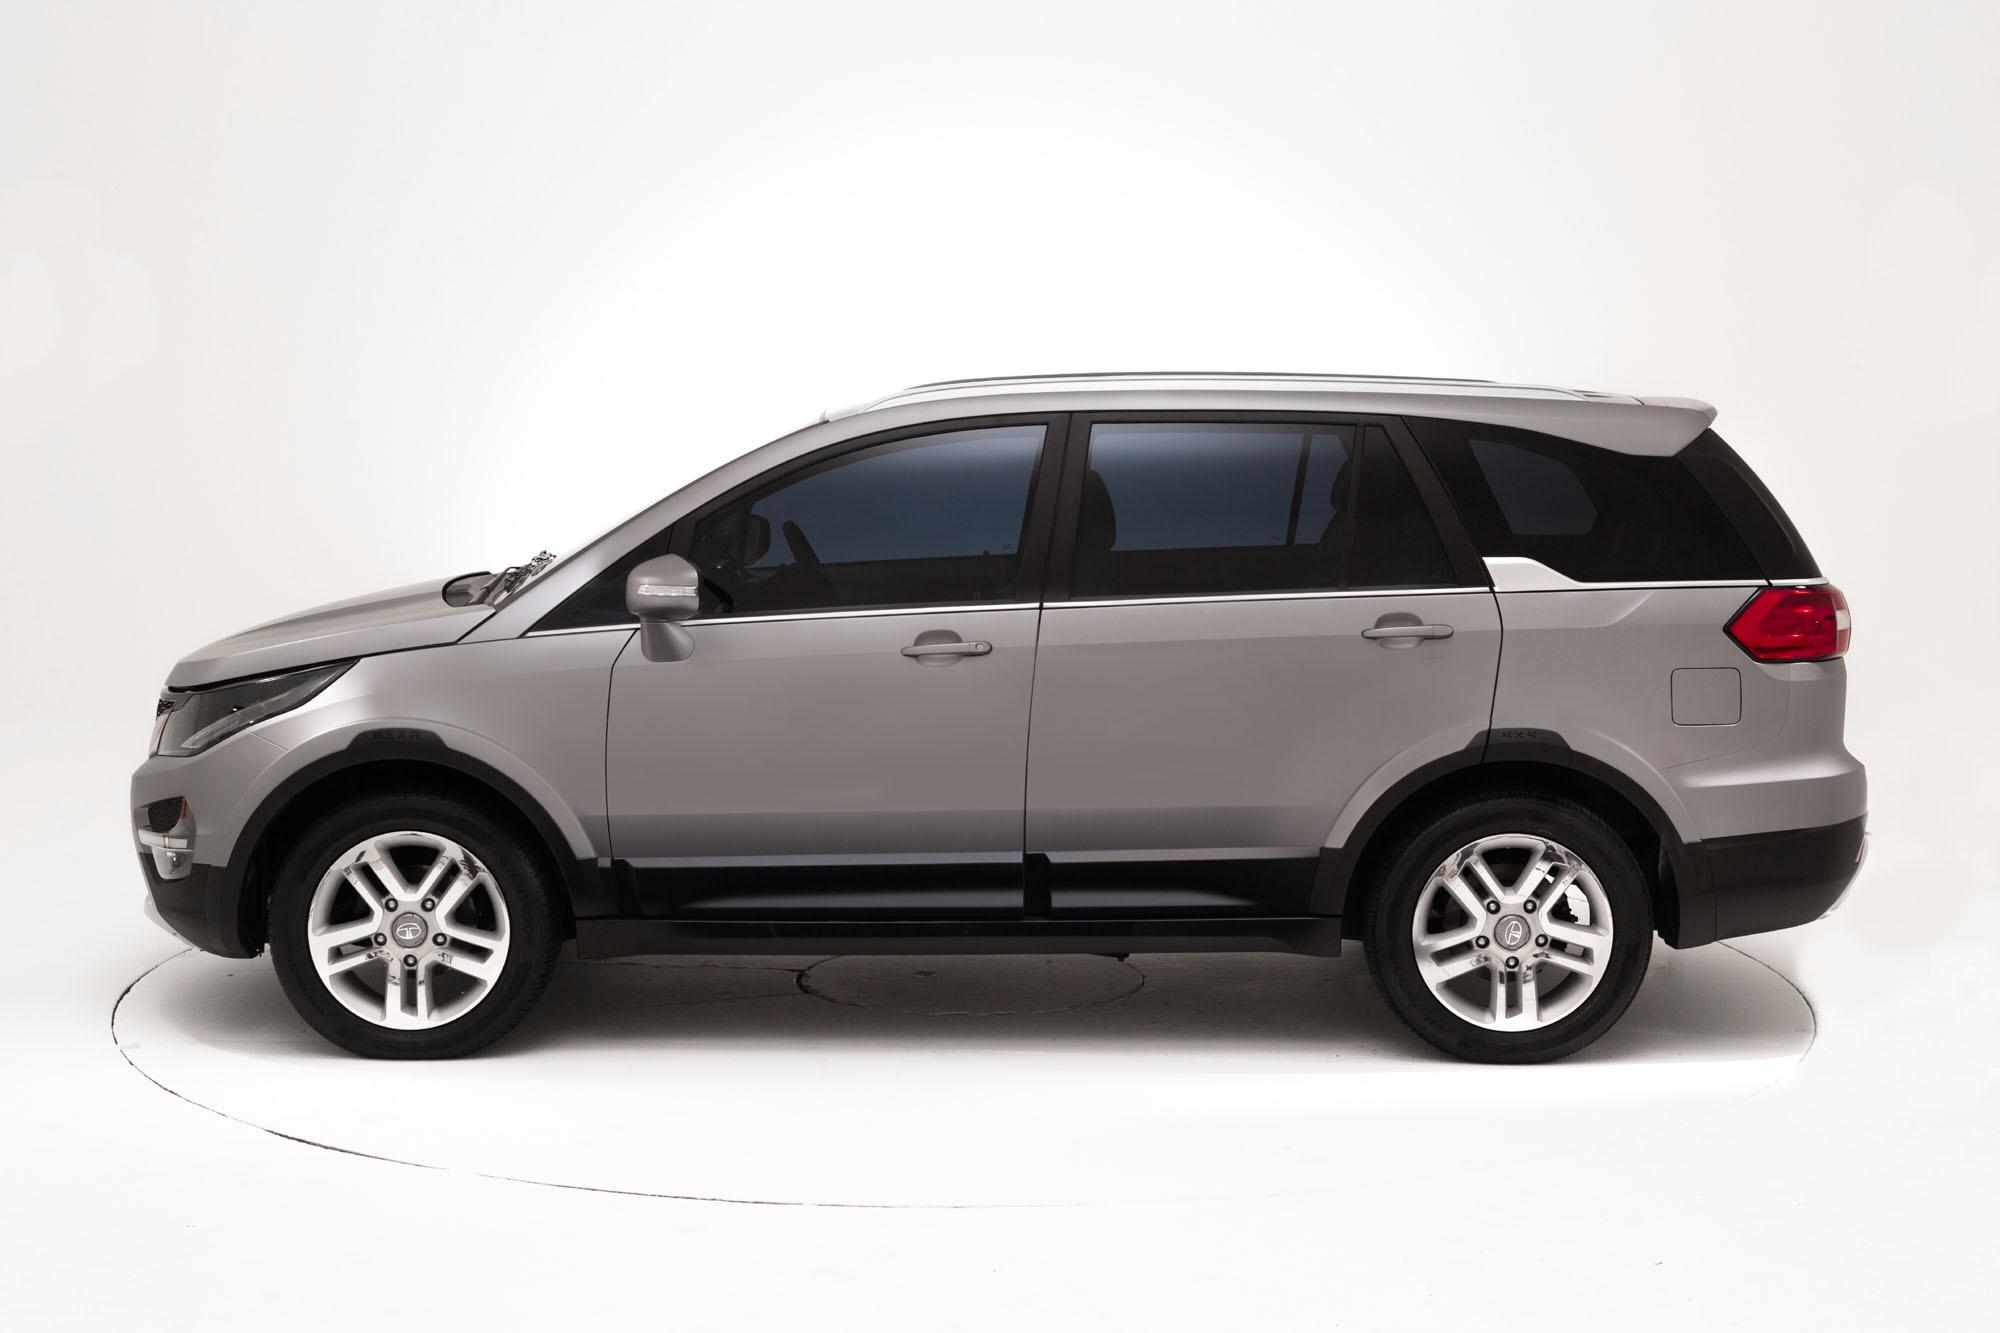 Hand Controls For Car >> Tata hexa - TATA HEXA XT 4X4 Customer Review - MouthShut.com